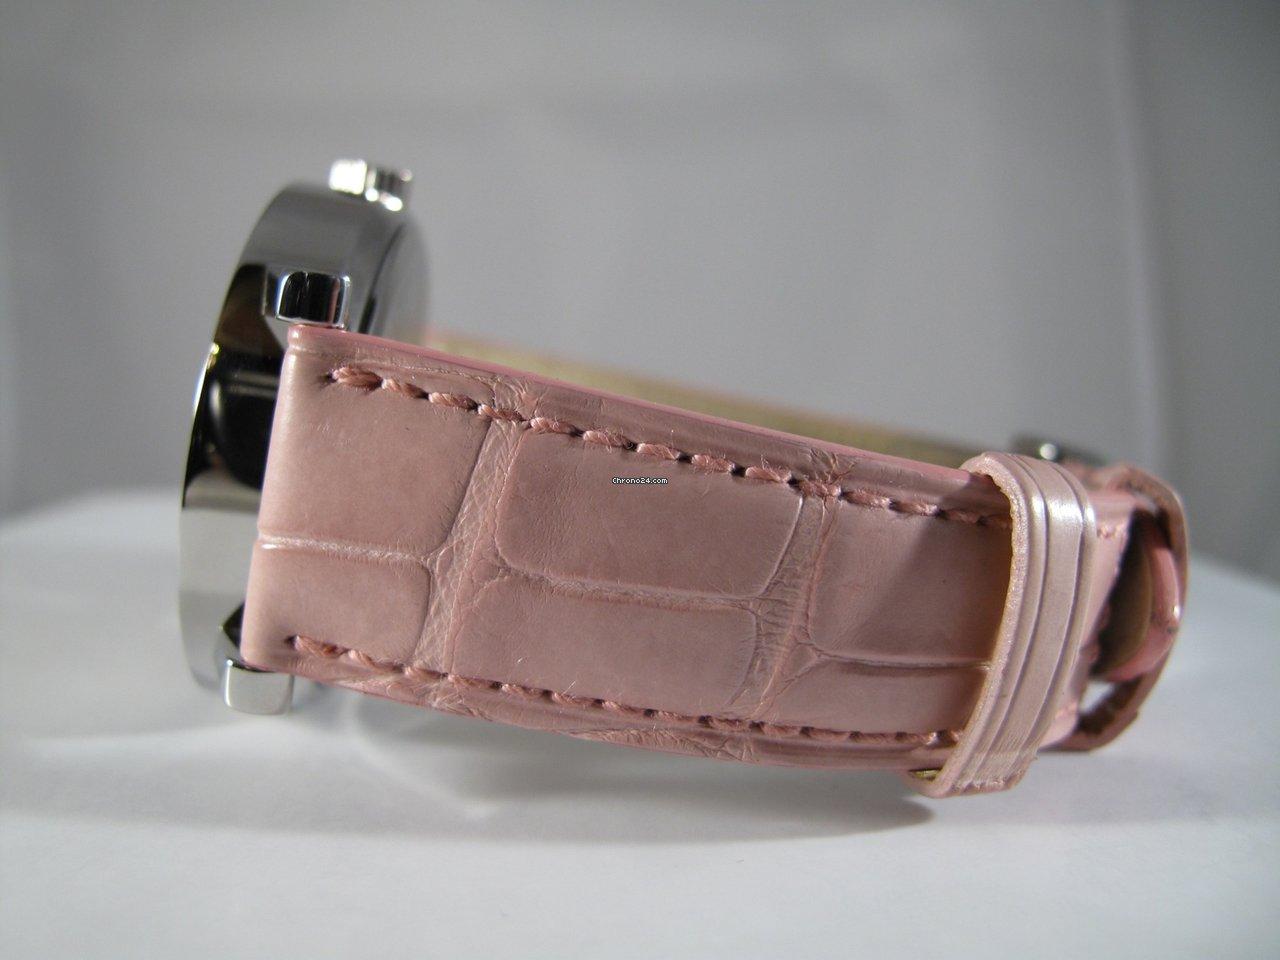 Bulgari Bvlgari 38 SL Automatic za Kč 54 835 k prodeji od Trusted Seller na  Chrono24 2768a2e2885